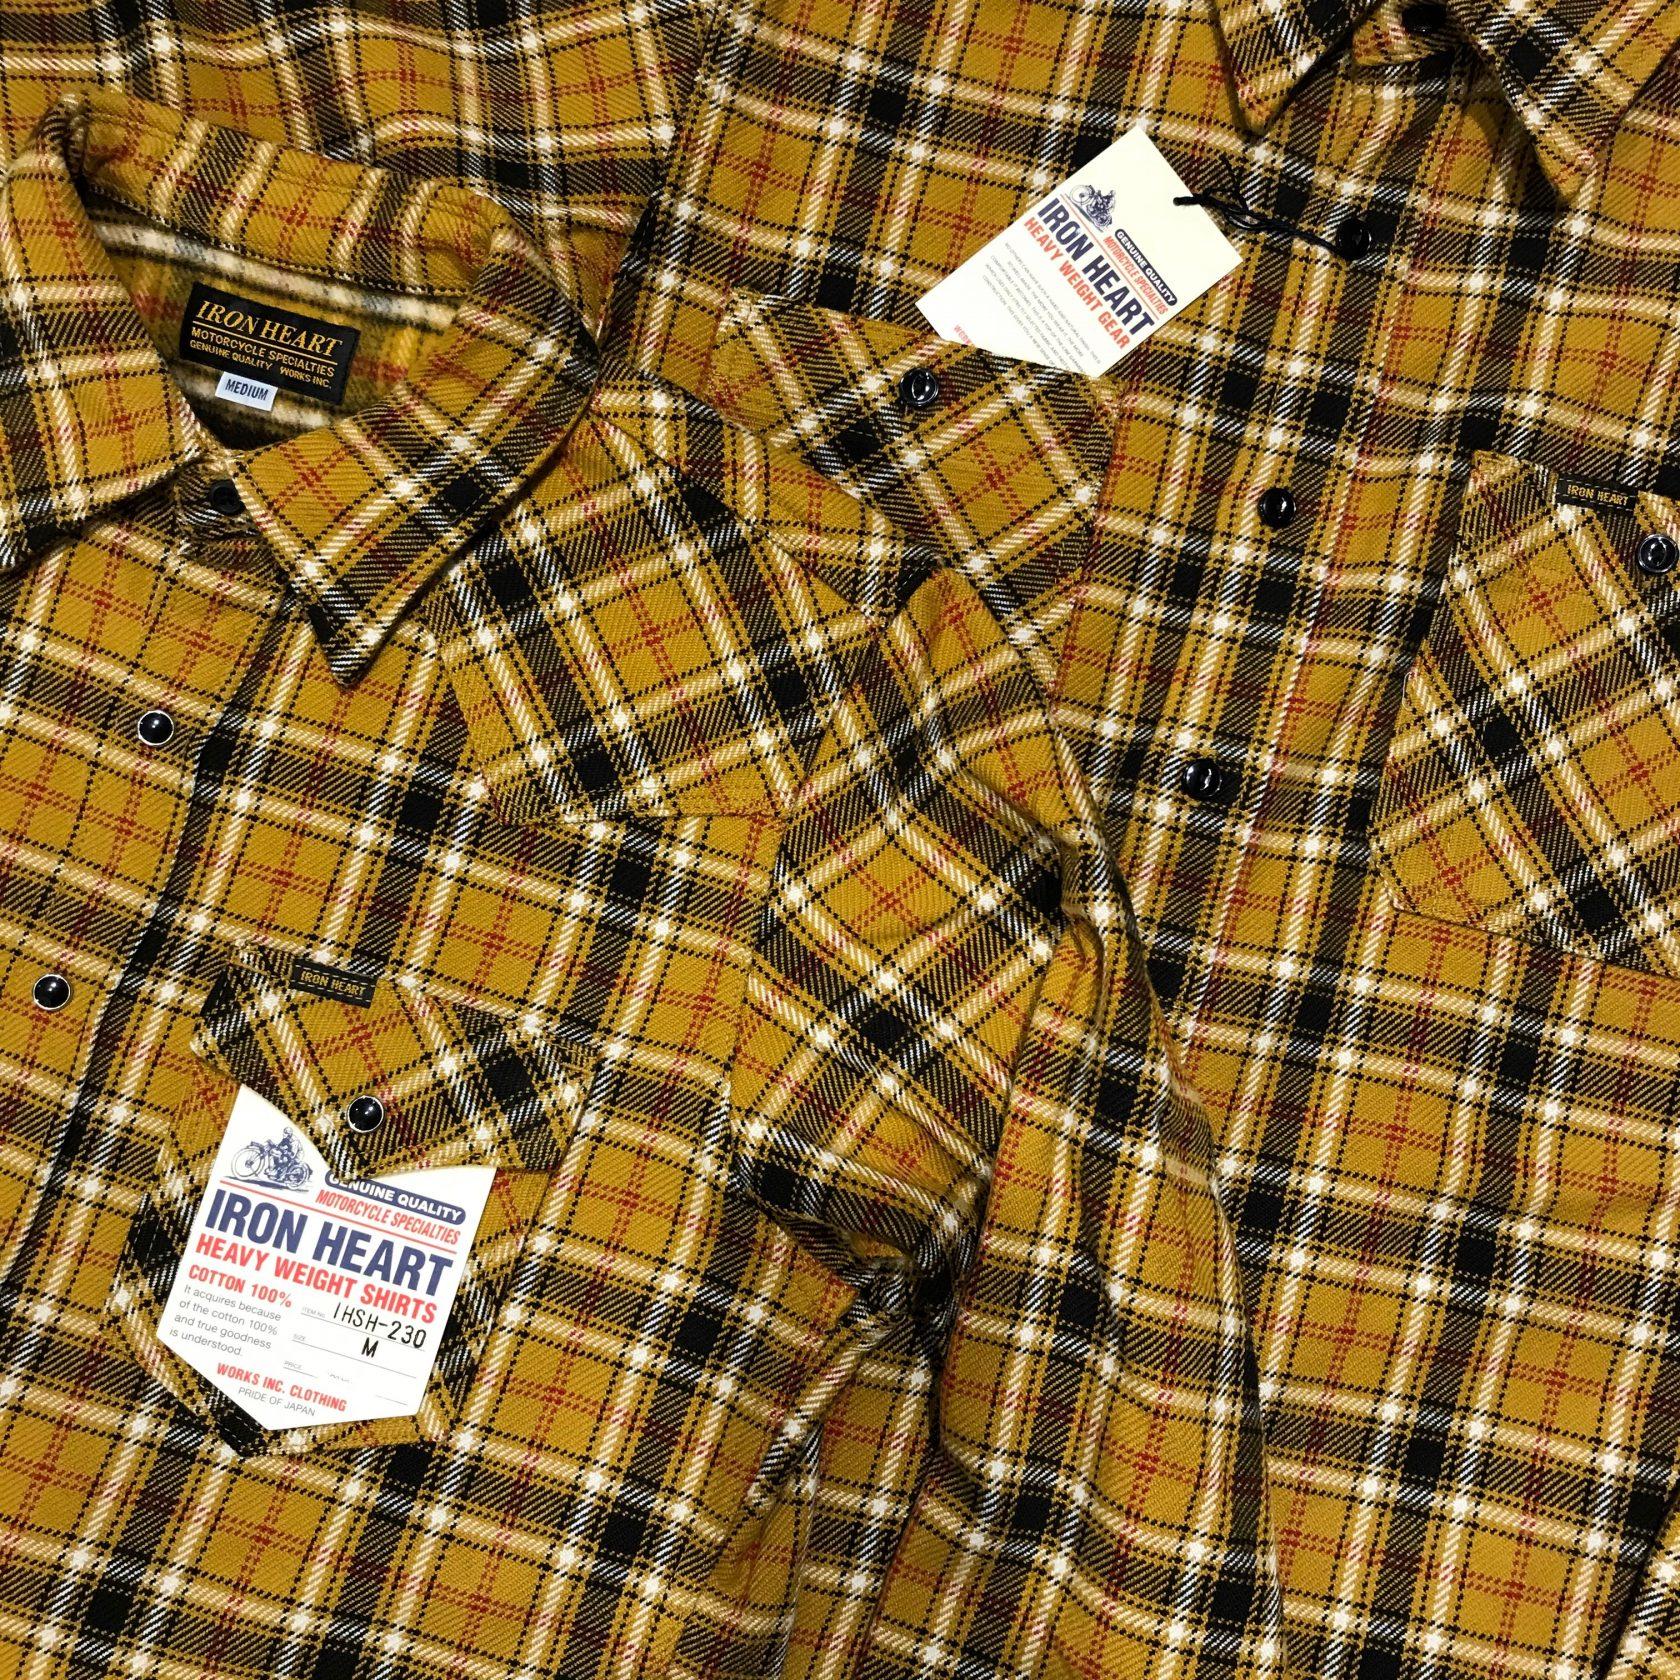 Iron Heart IHSH-230 western and IHSH-242 work flannel shirt mustard